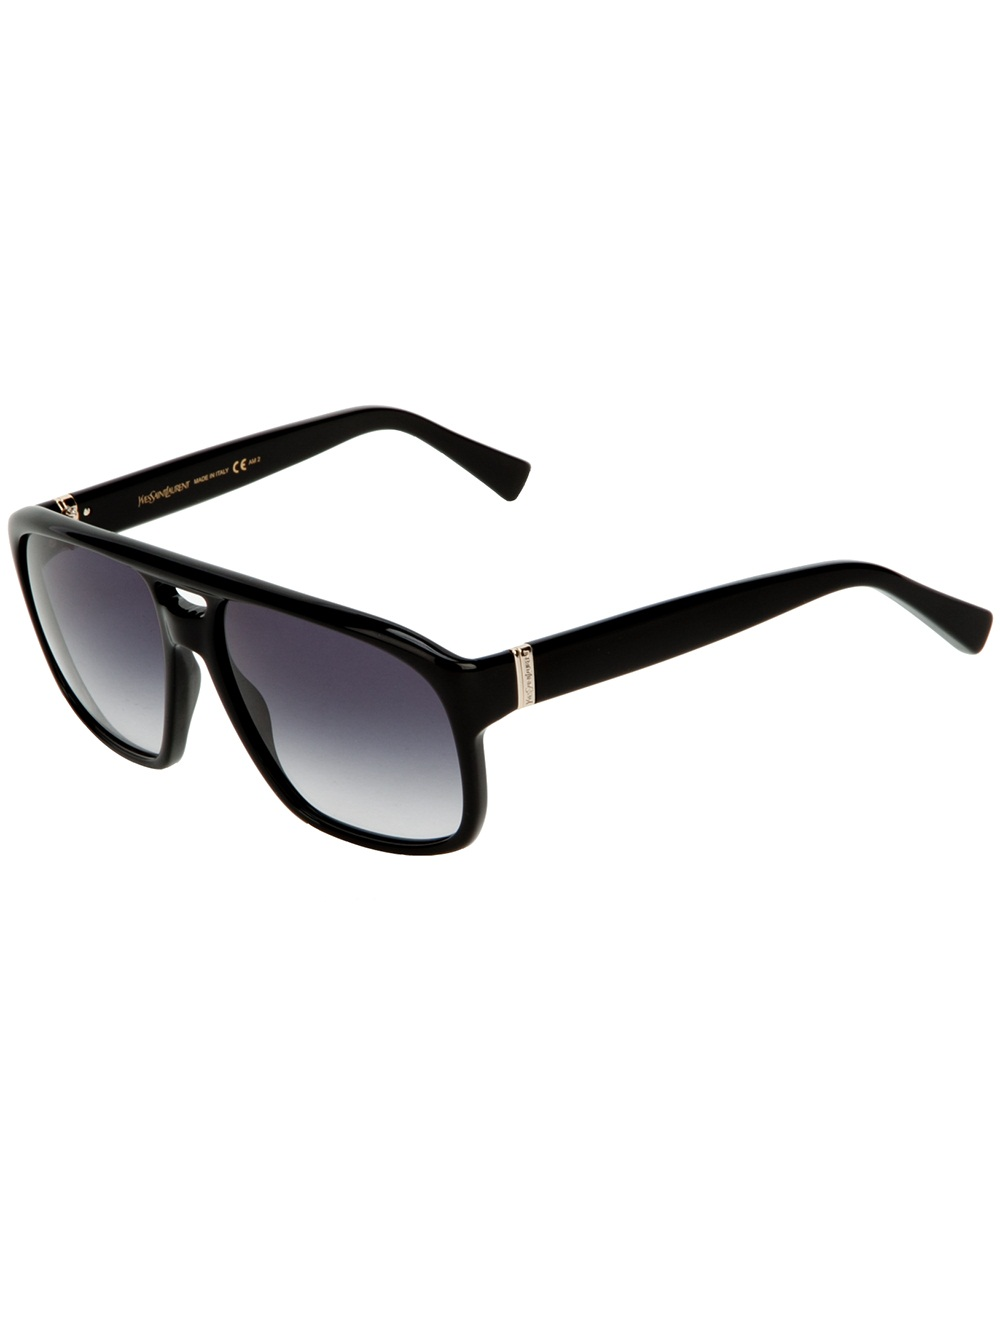 840697fd2df Lyst - Saint Laurent Square Frame Sunglasses in Black for Men